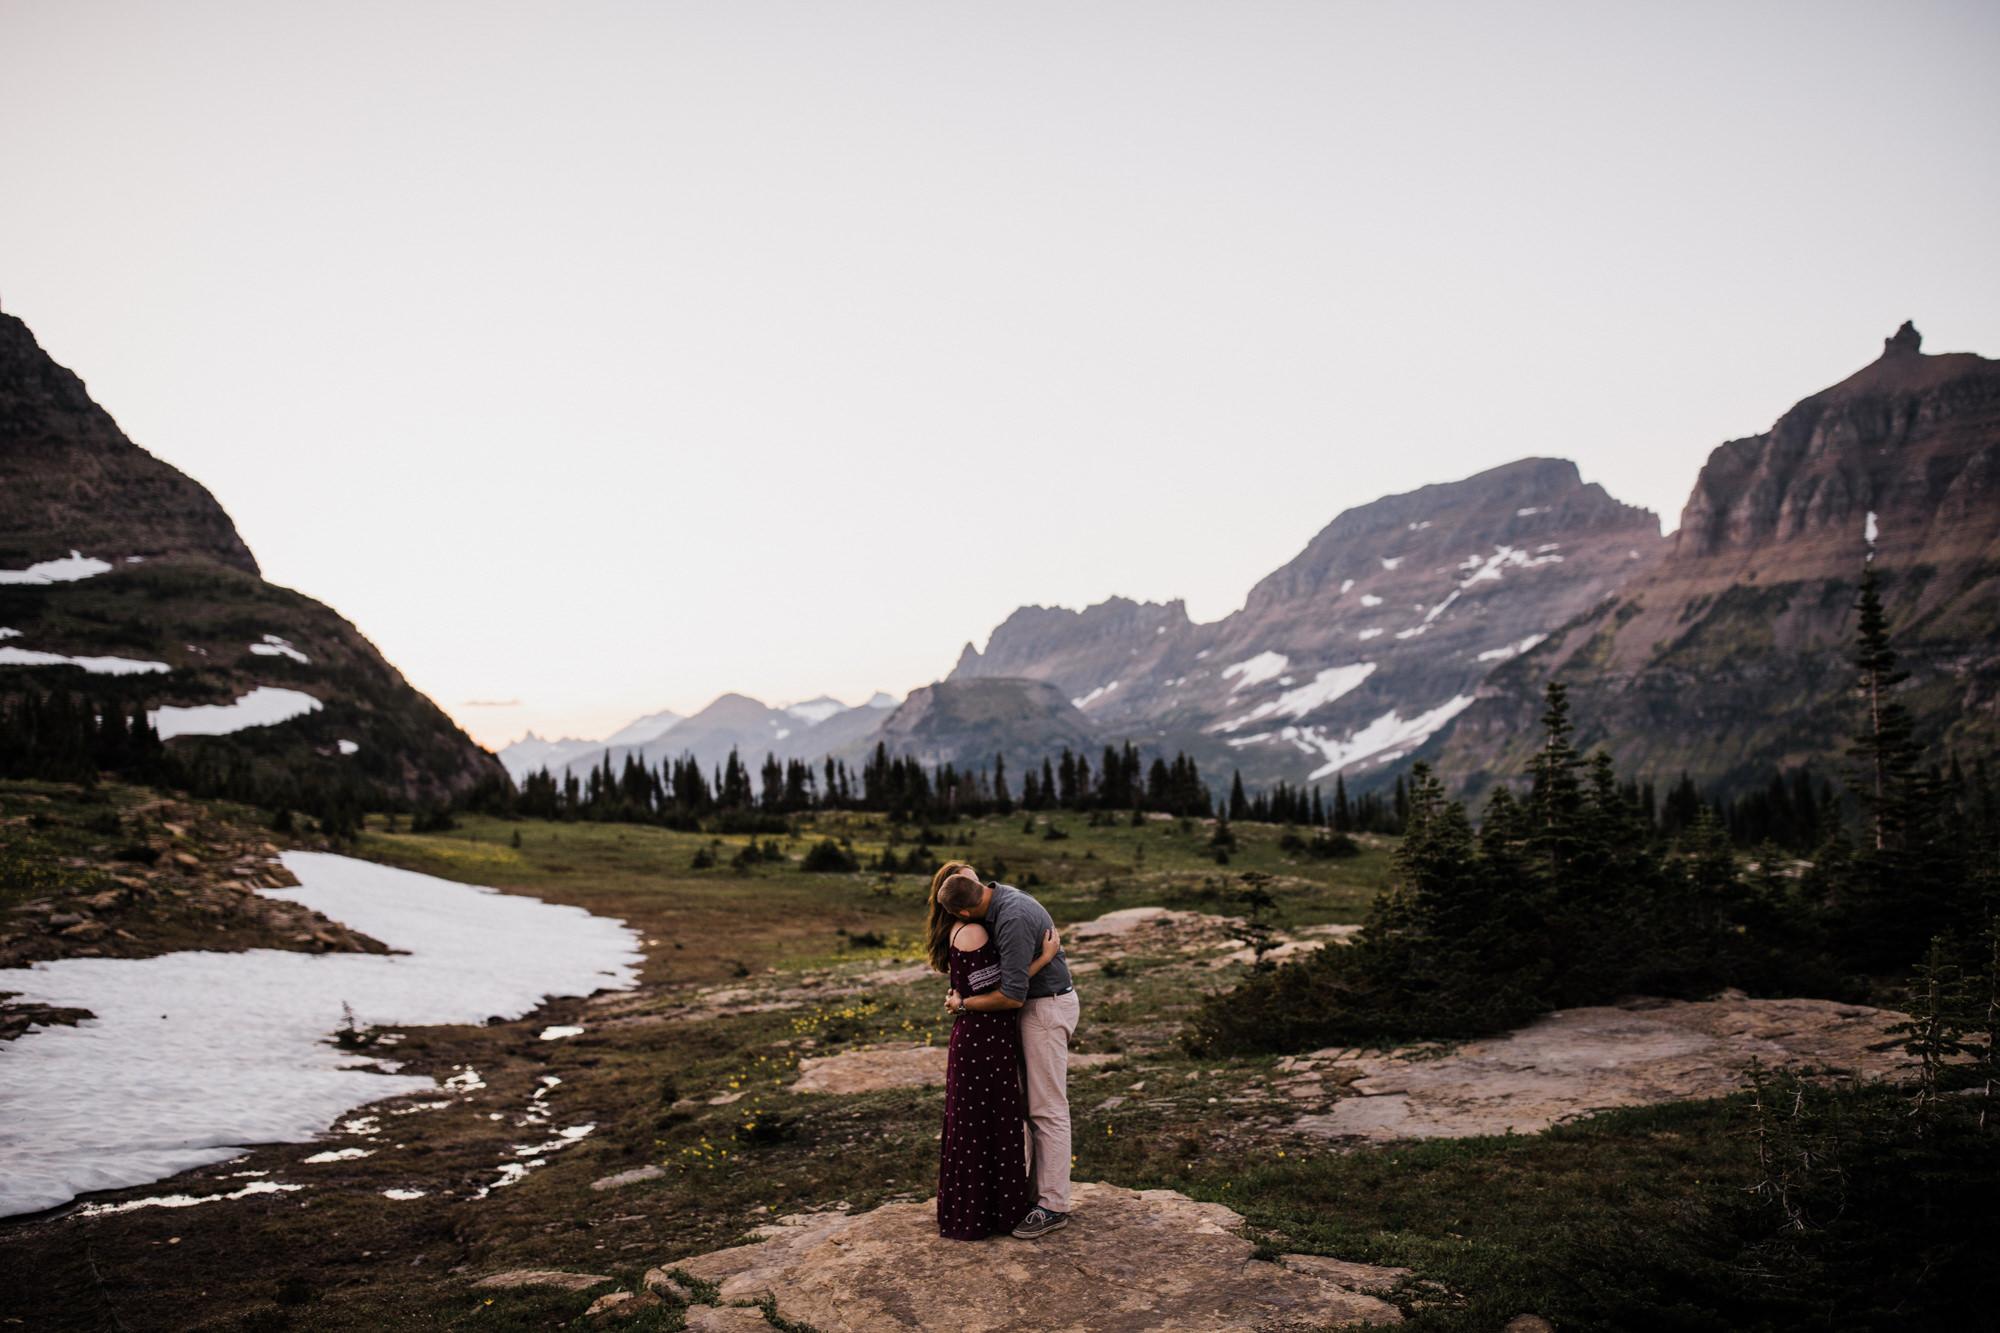 mountain top adventure session in glacier national park | destination engagement photo inspiration | utah adventure elopement photographers | the hearnes adventure photography | www.thehearnes.com